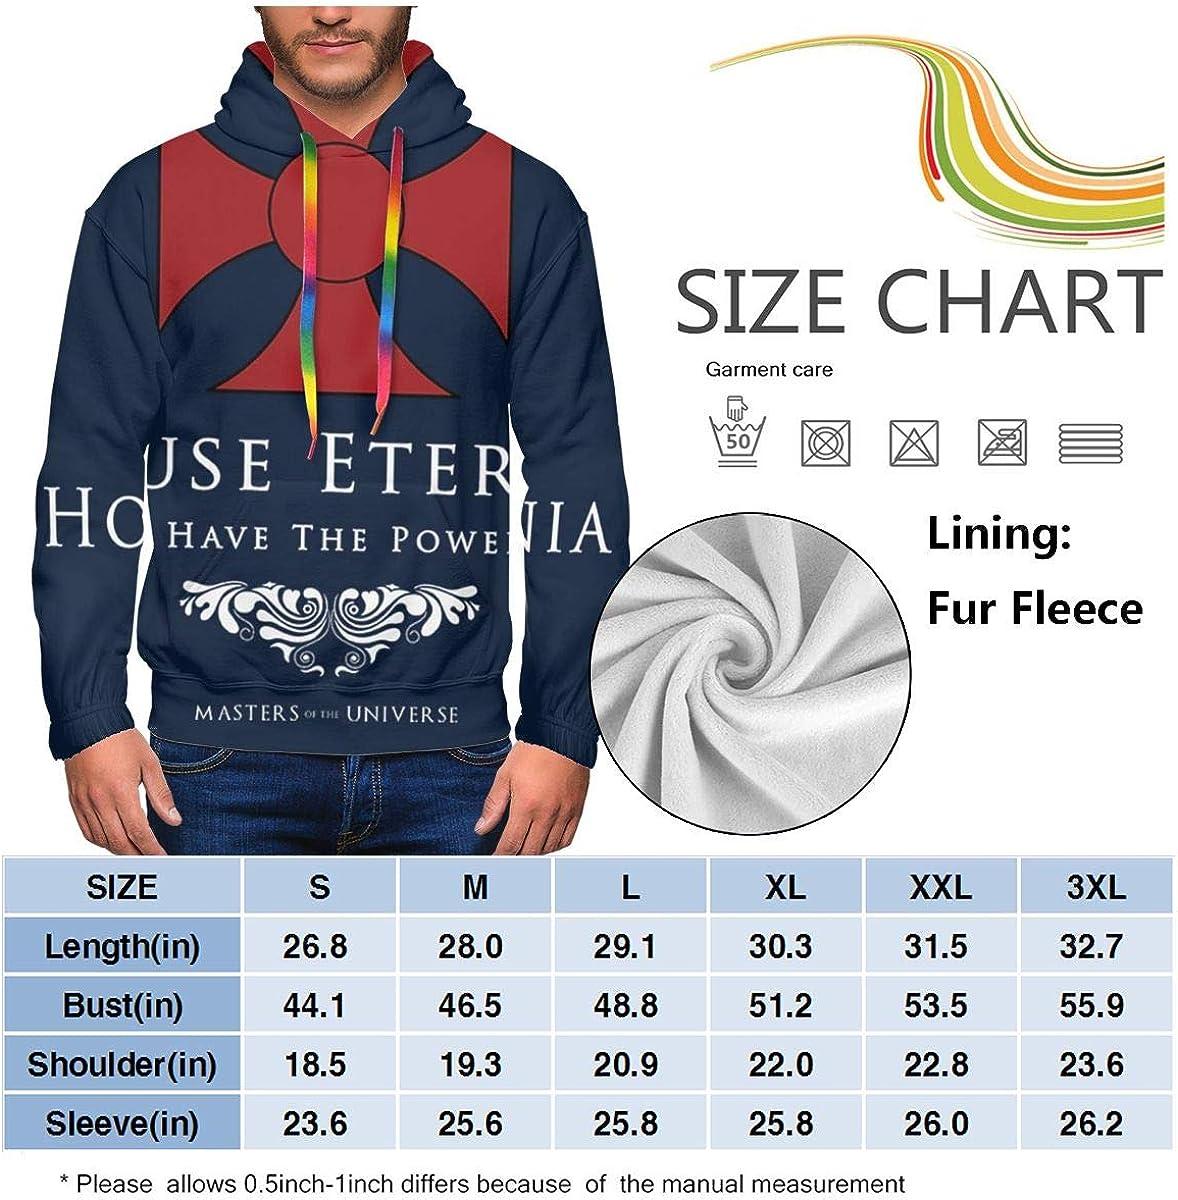 House Eternia Herren Kapuzenpullover I Have The Power He Man Masters of The Universe Fashion Sweatshirt Hoodie Pullover Taschen Plus Samt Schwarz